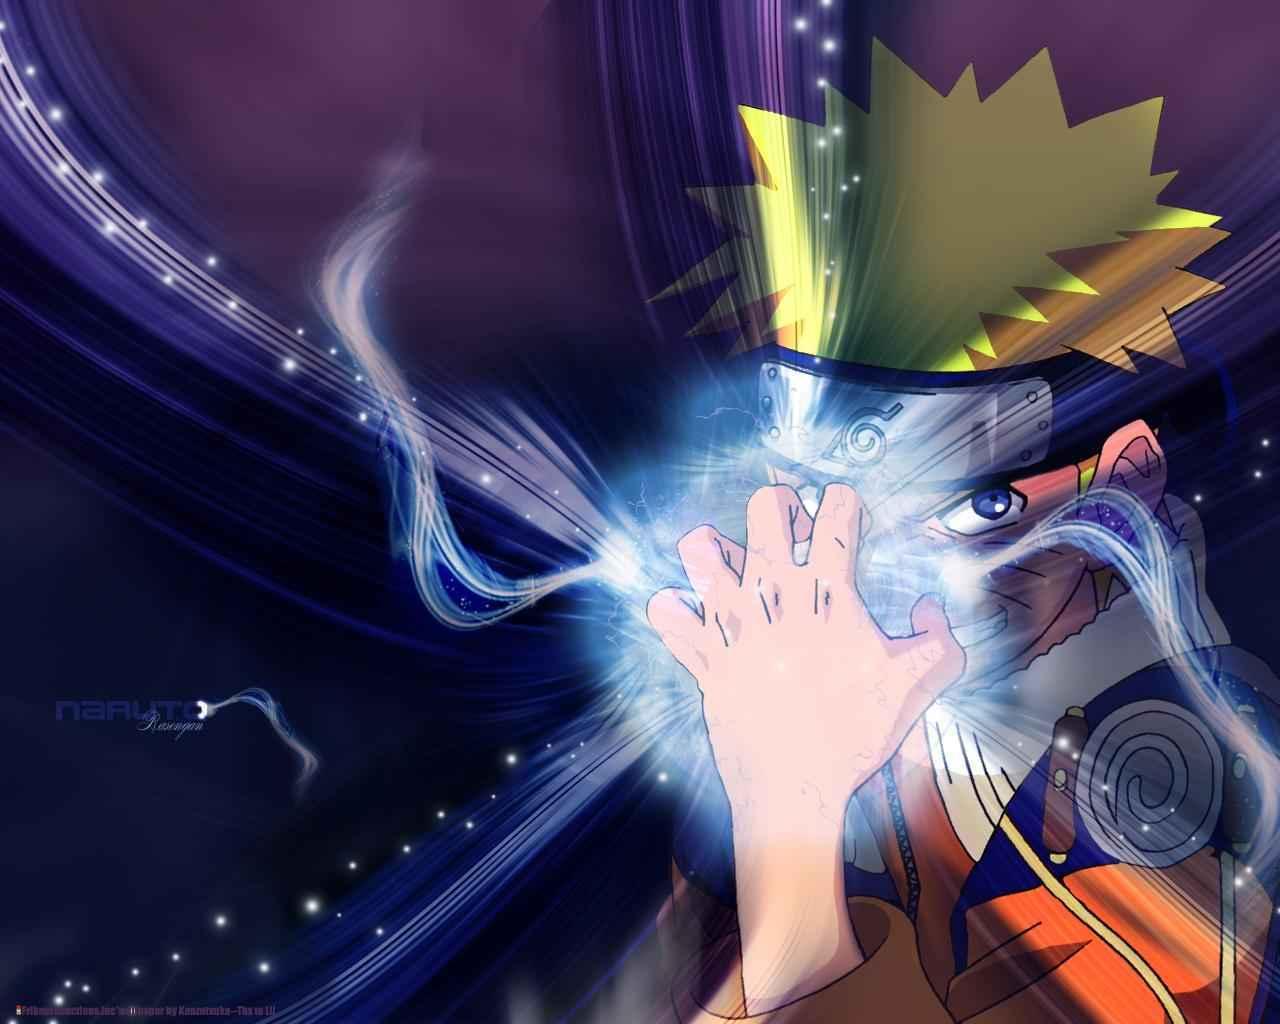 Imagenes HD de Naruto y Naruto Shippuden descarga gratis   Todotegusta 1280x1024